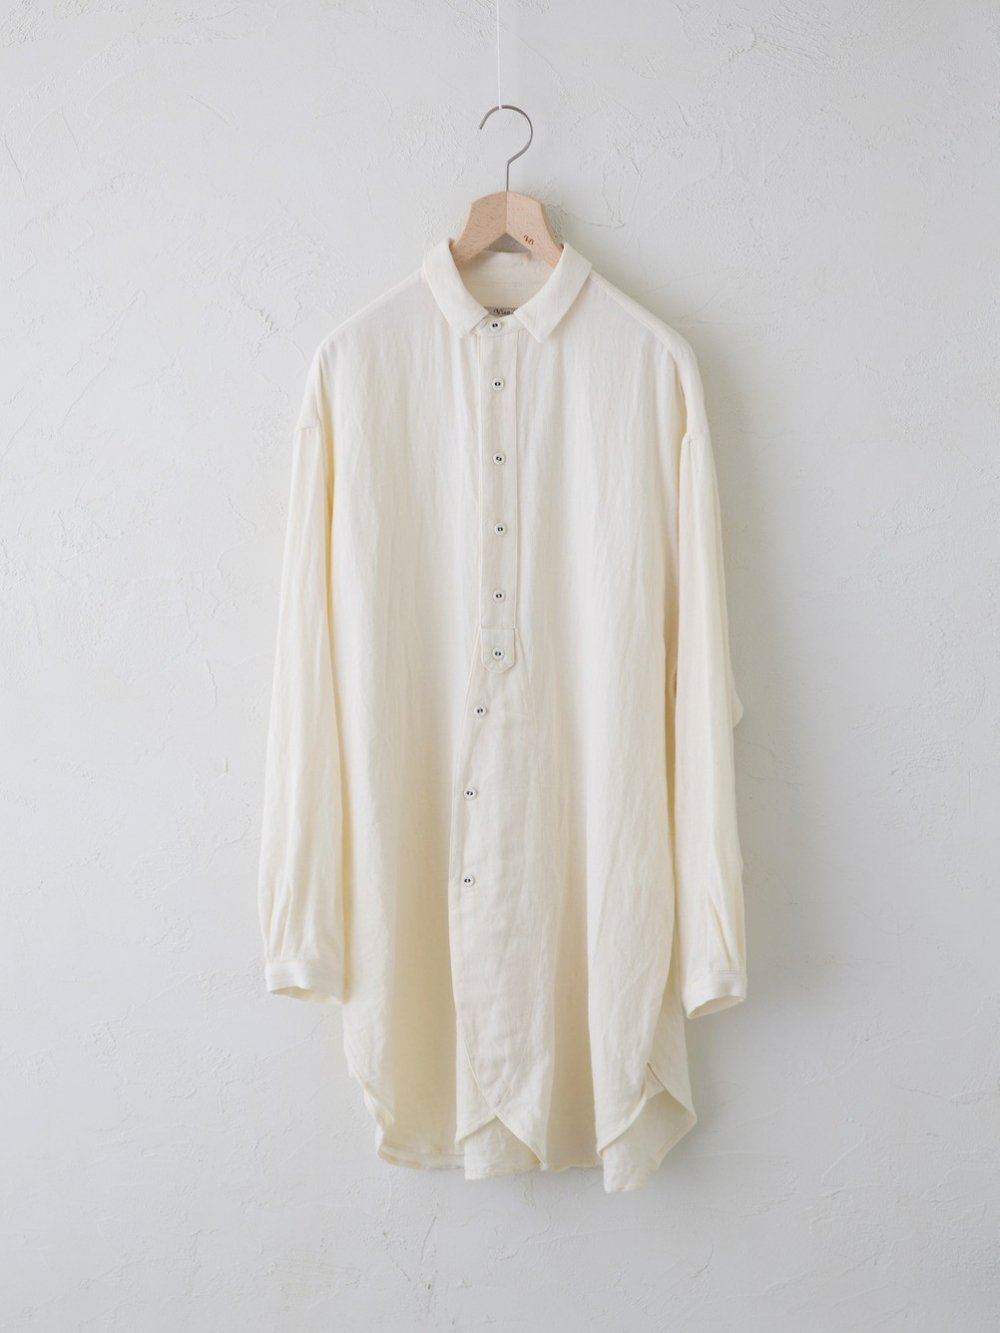 Vintage Double Face チュニックシャツ(Unisex)